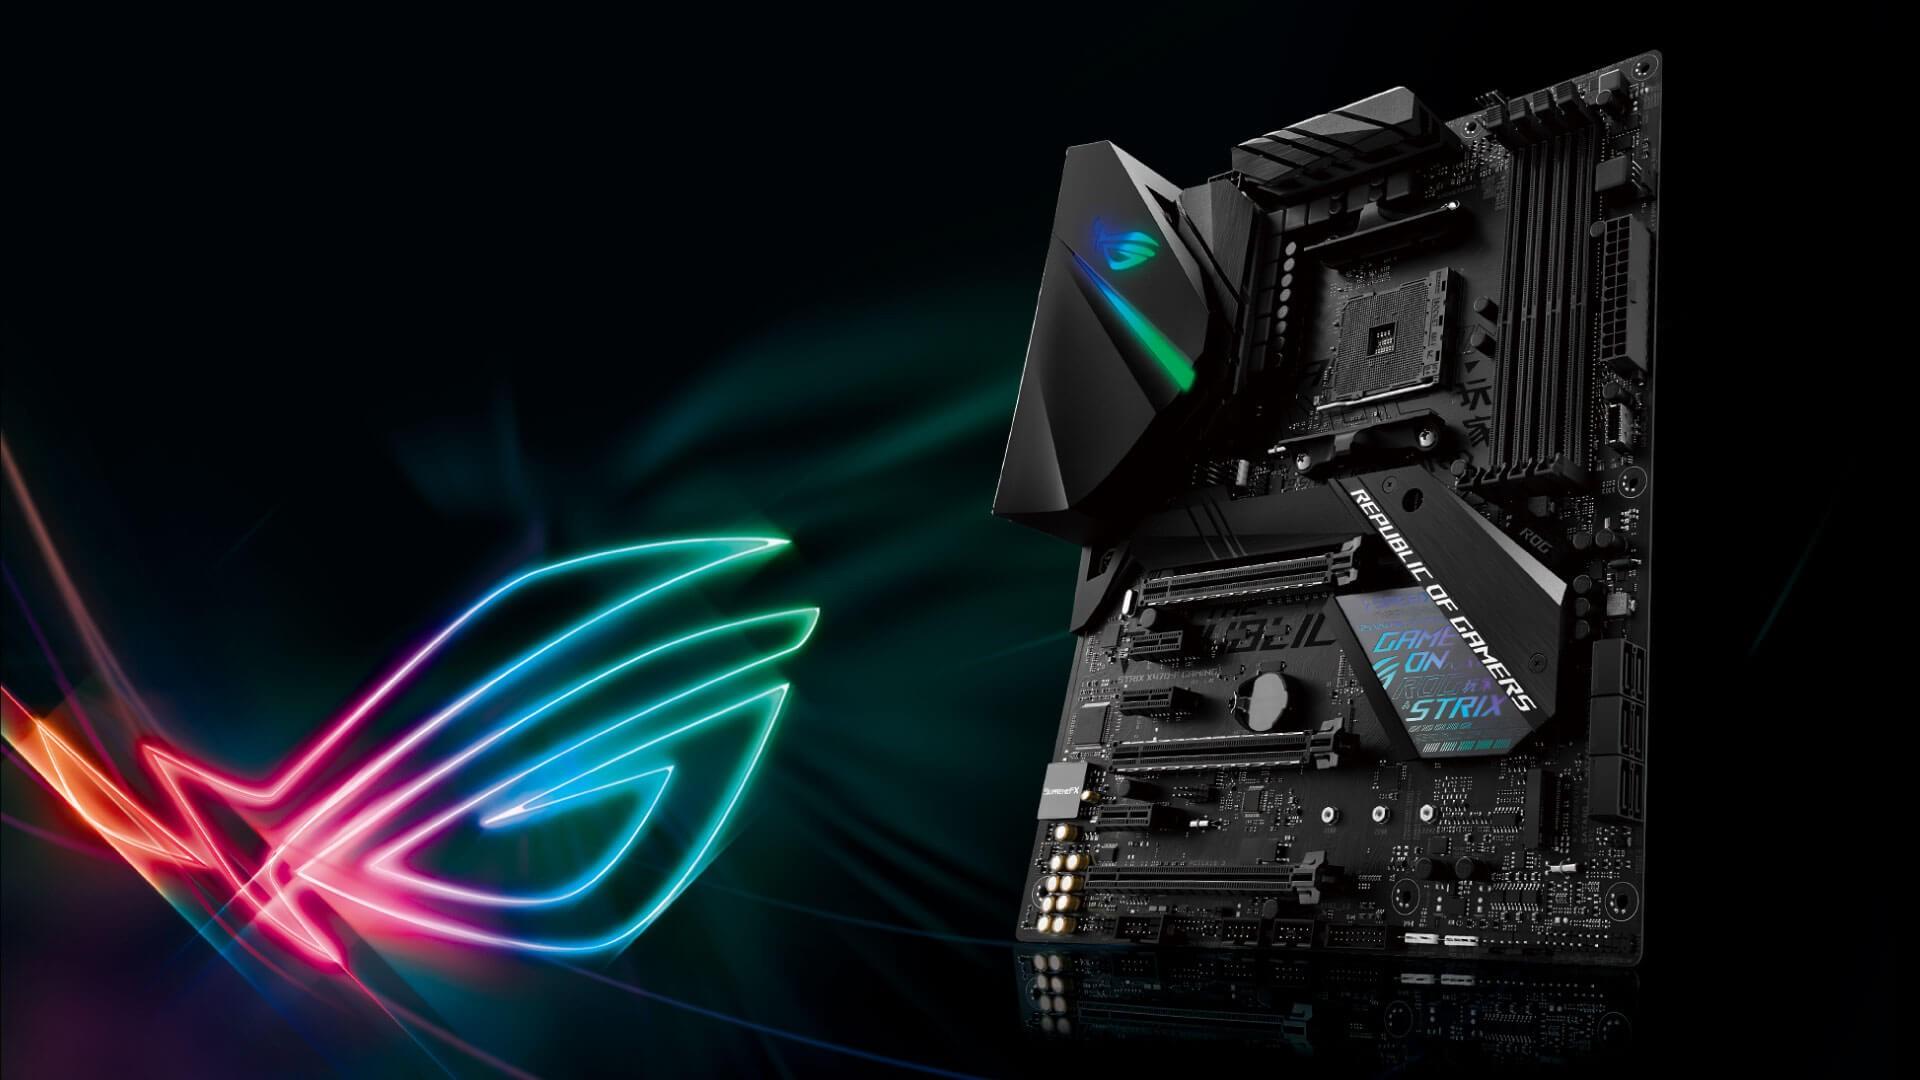 Asus анонсировала начало продаж материнских плат для процессоров AMD Pinnacle Ridge